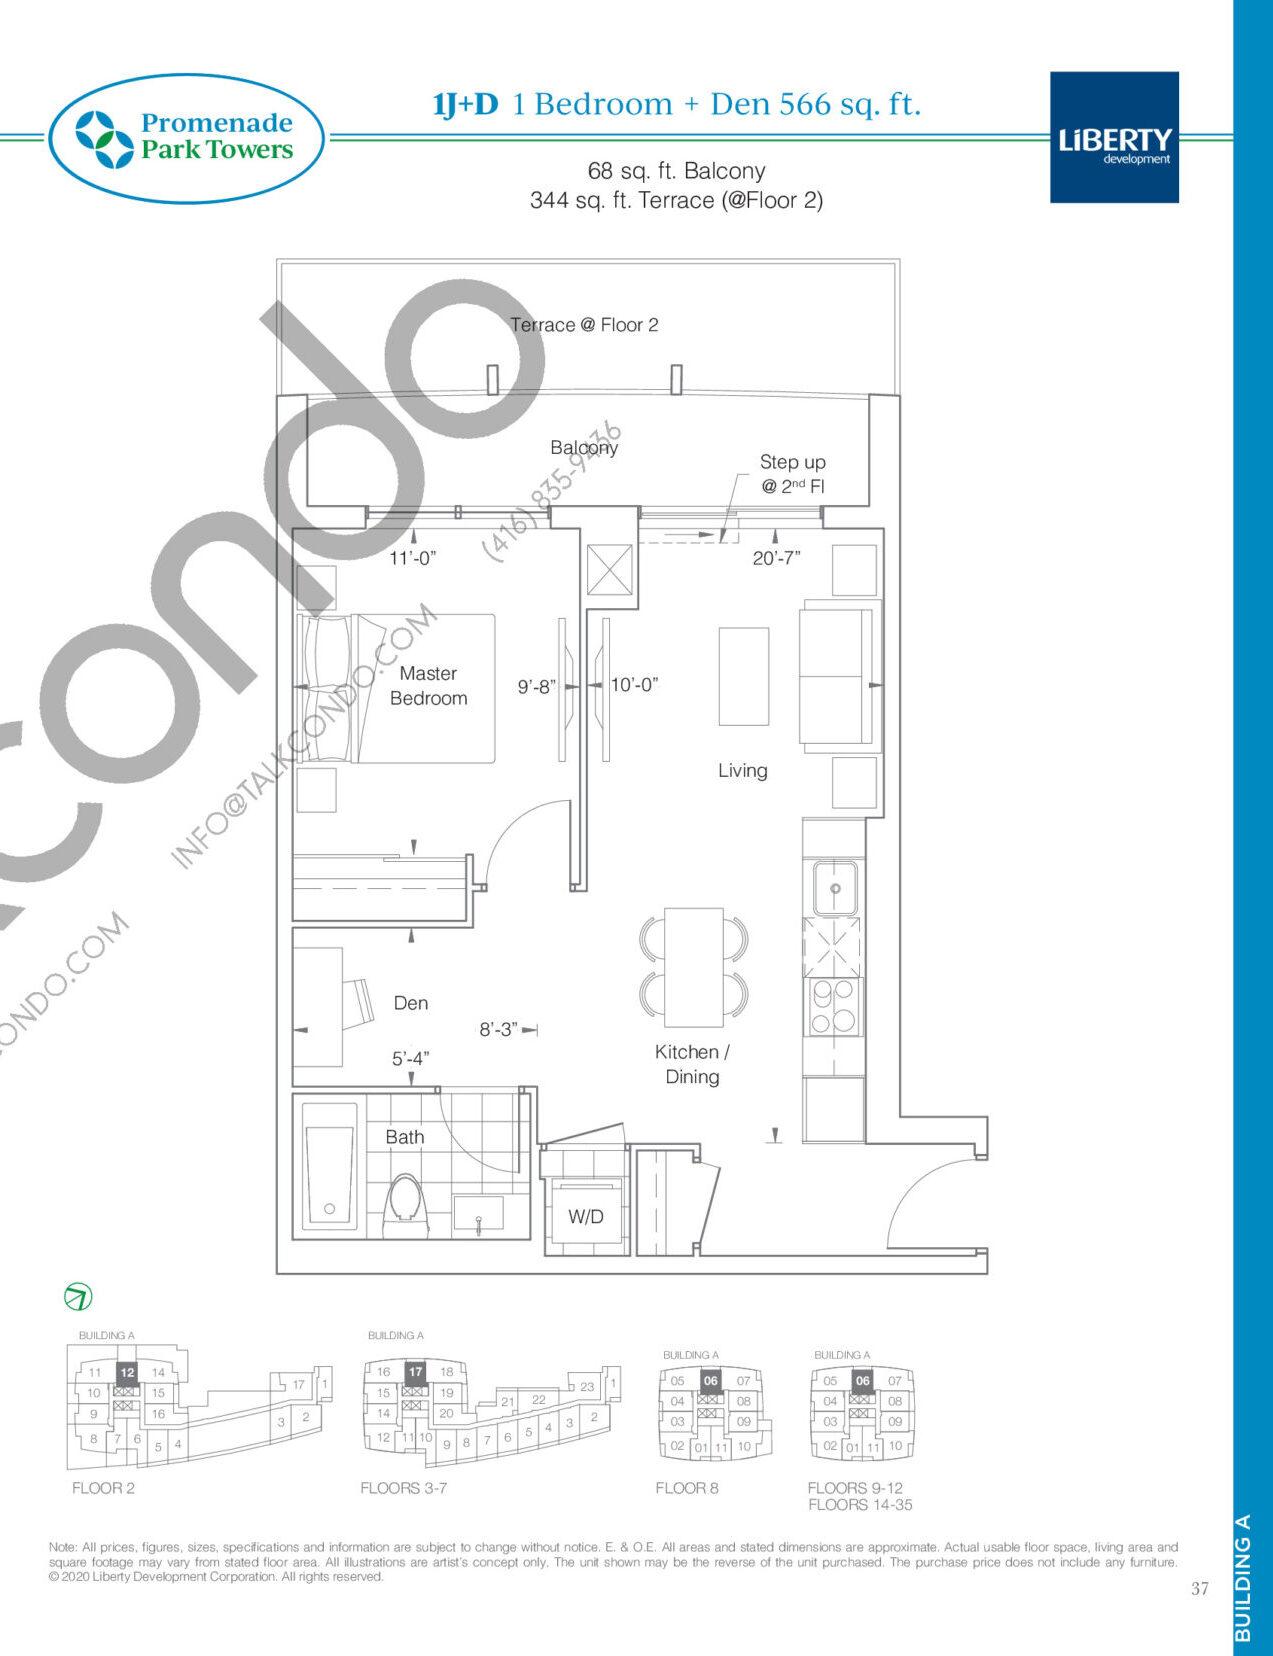 1J+D Floor Plan at Promenade Park Towers Condos - 566 sq.ft